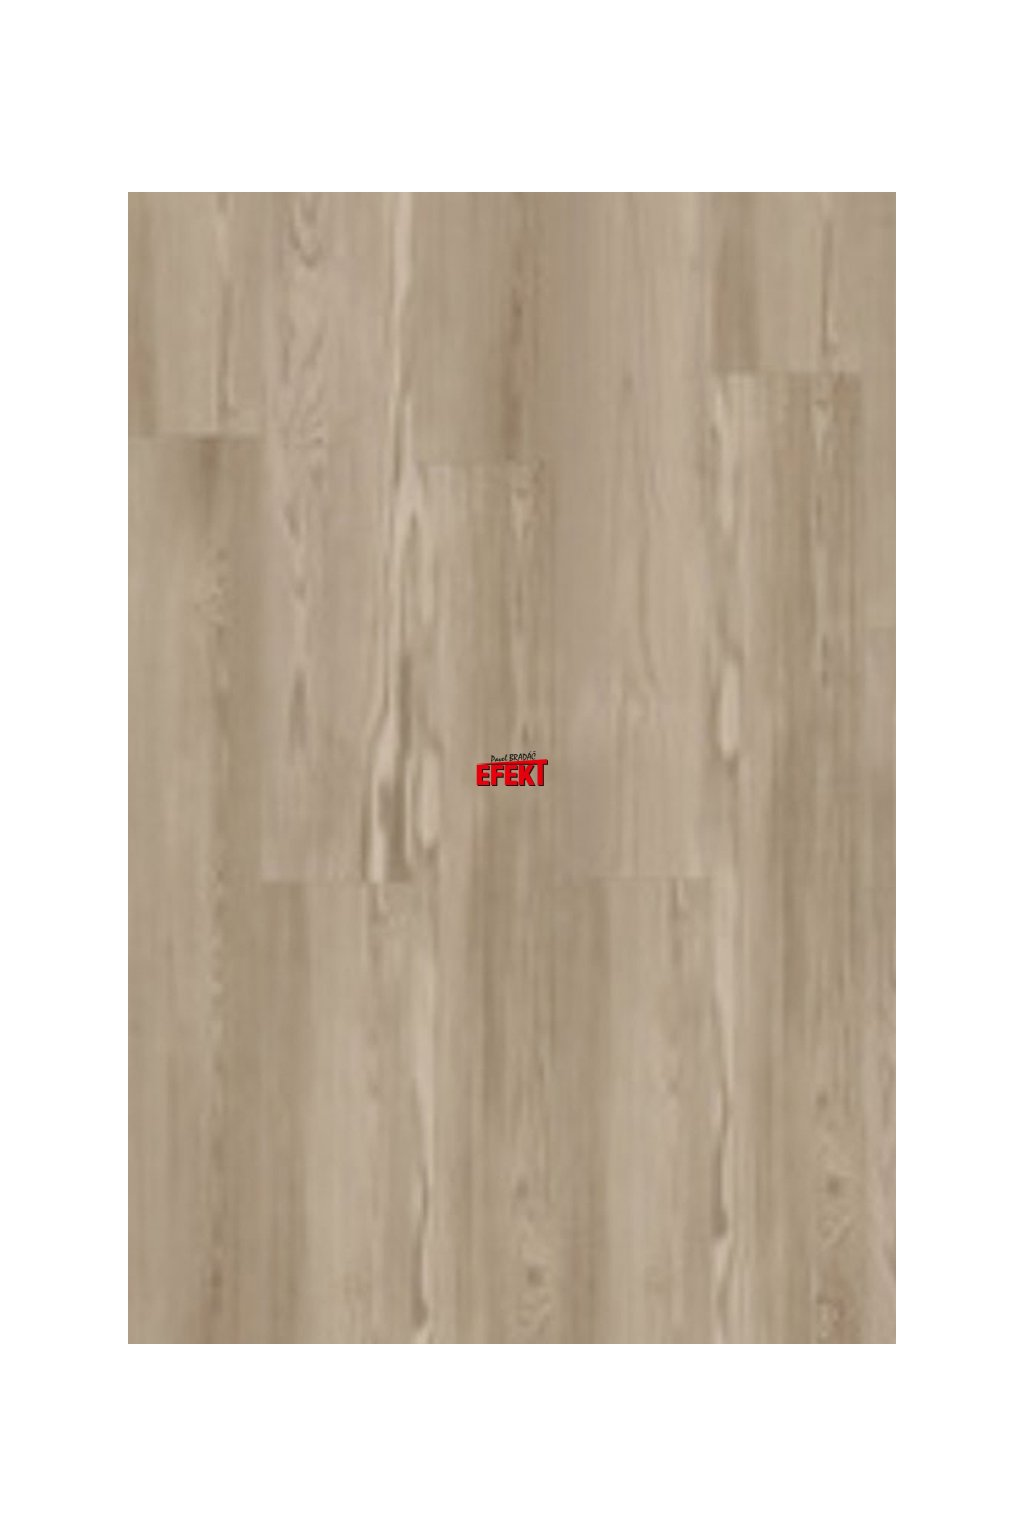 Gerflor Lepený 55 North Wood Mokaccino